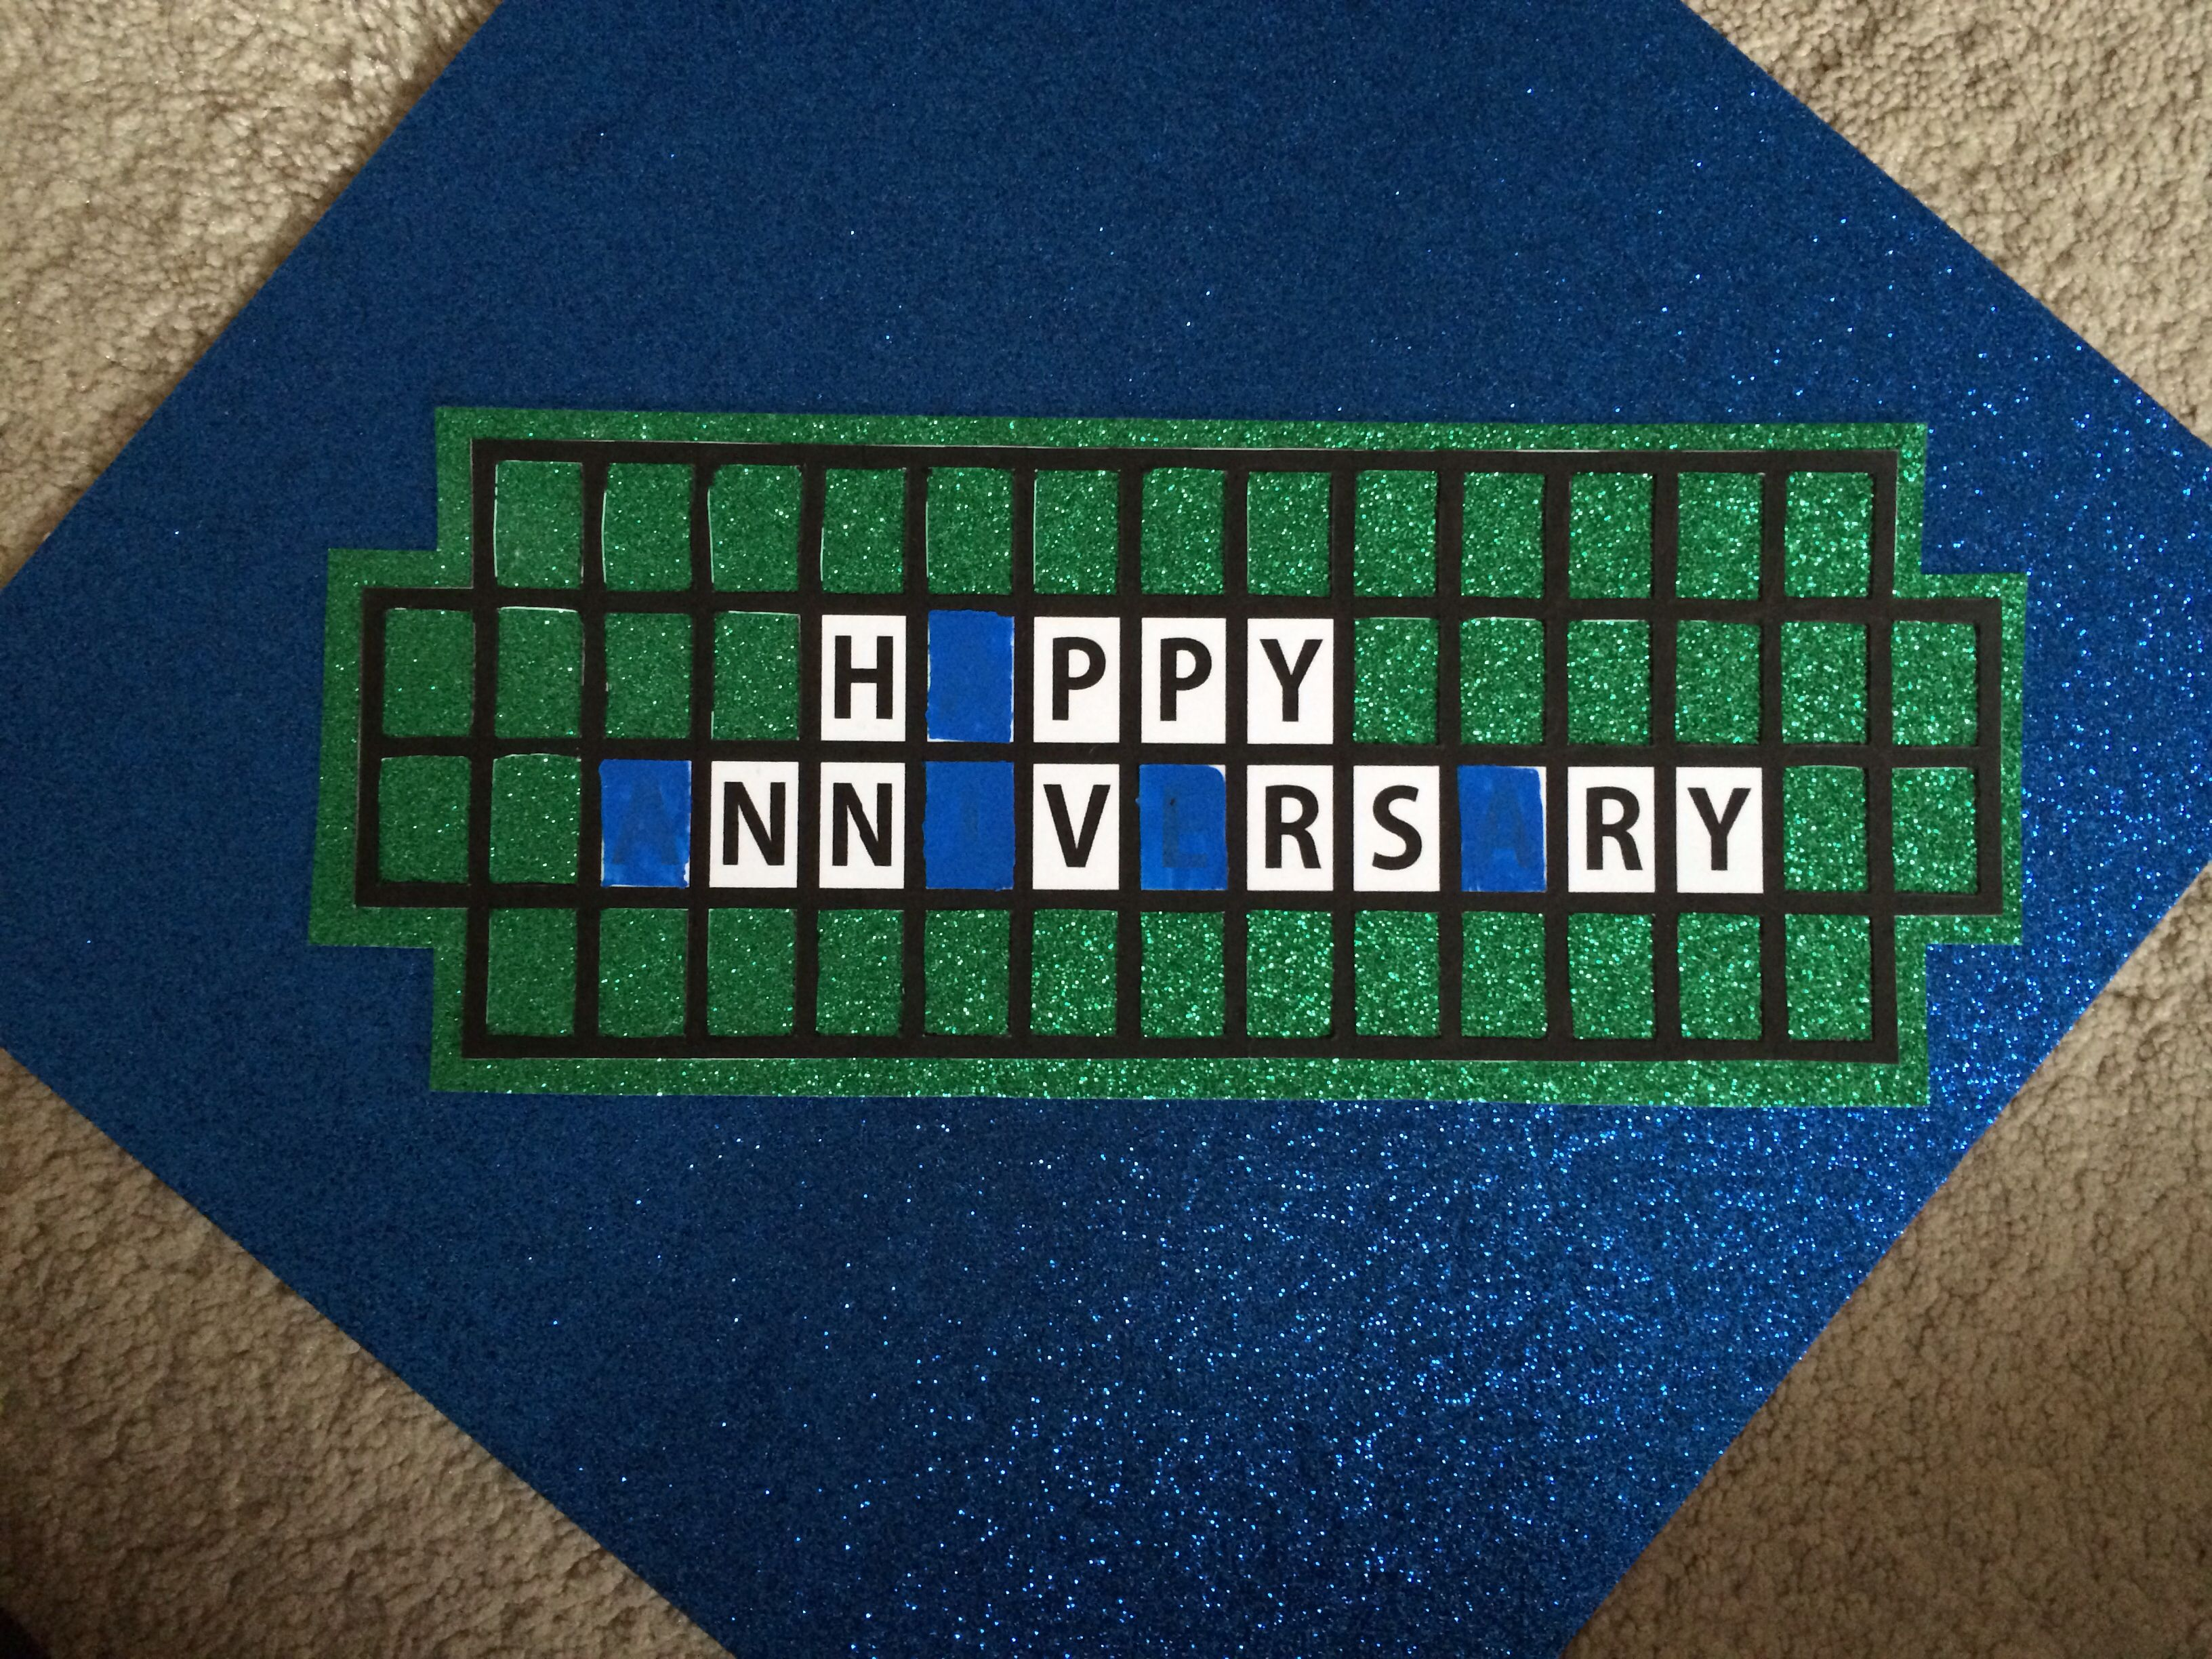 Diy wheel of fortune scratch off anniversary card cut clear tape